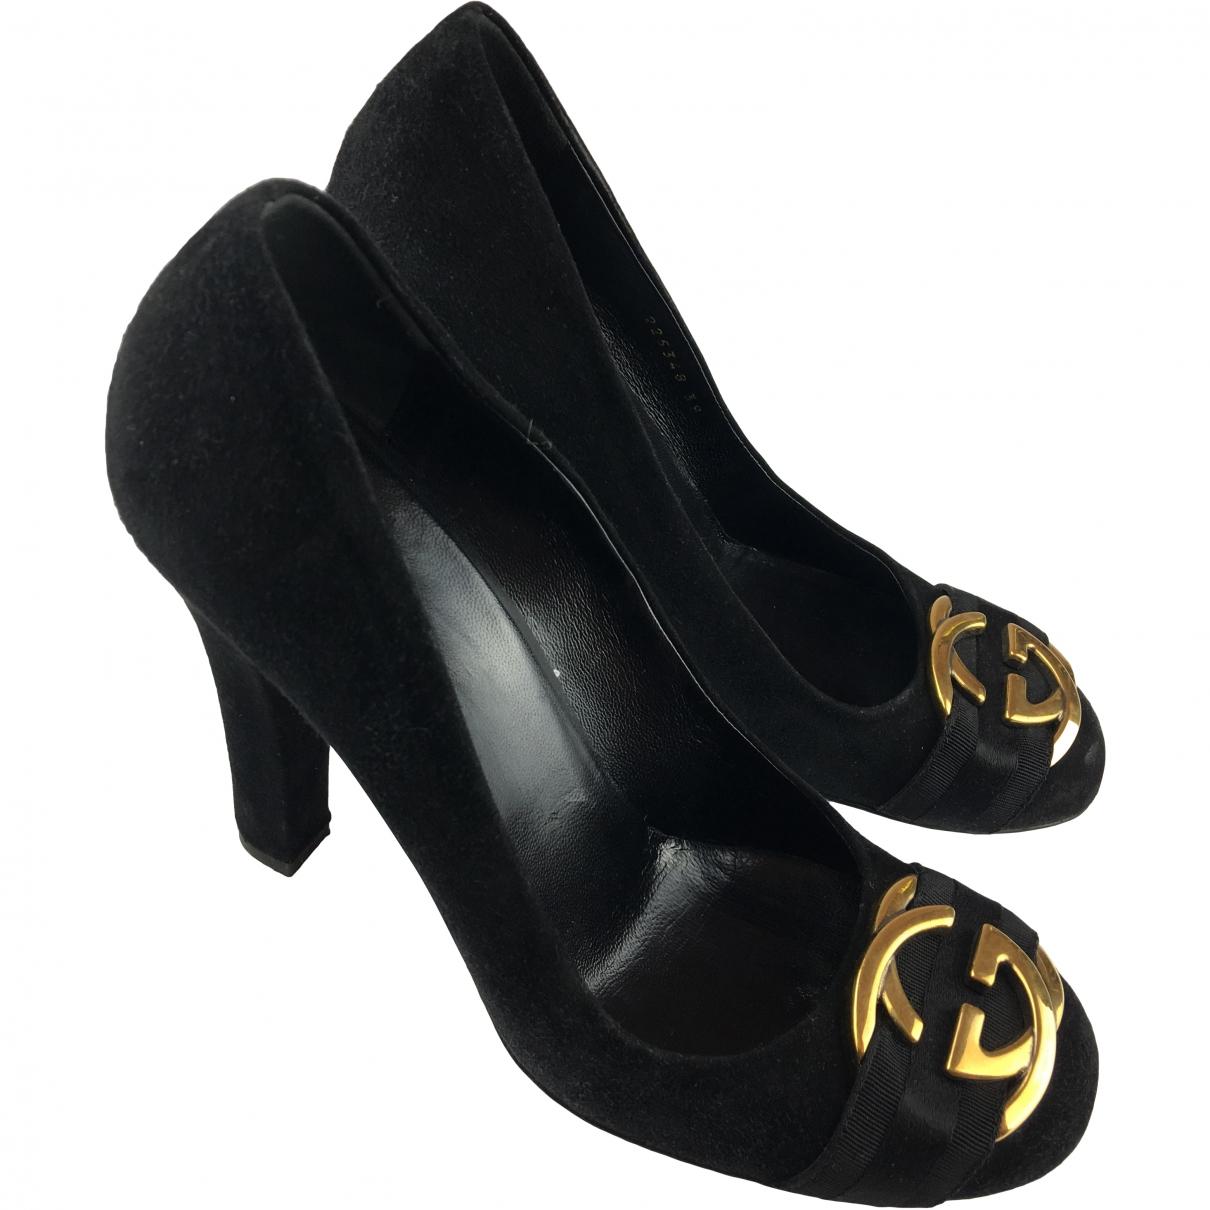 Gucci \N Black Suede Heels for Women 39 EU